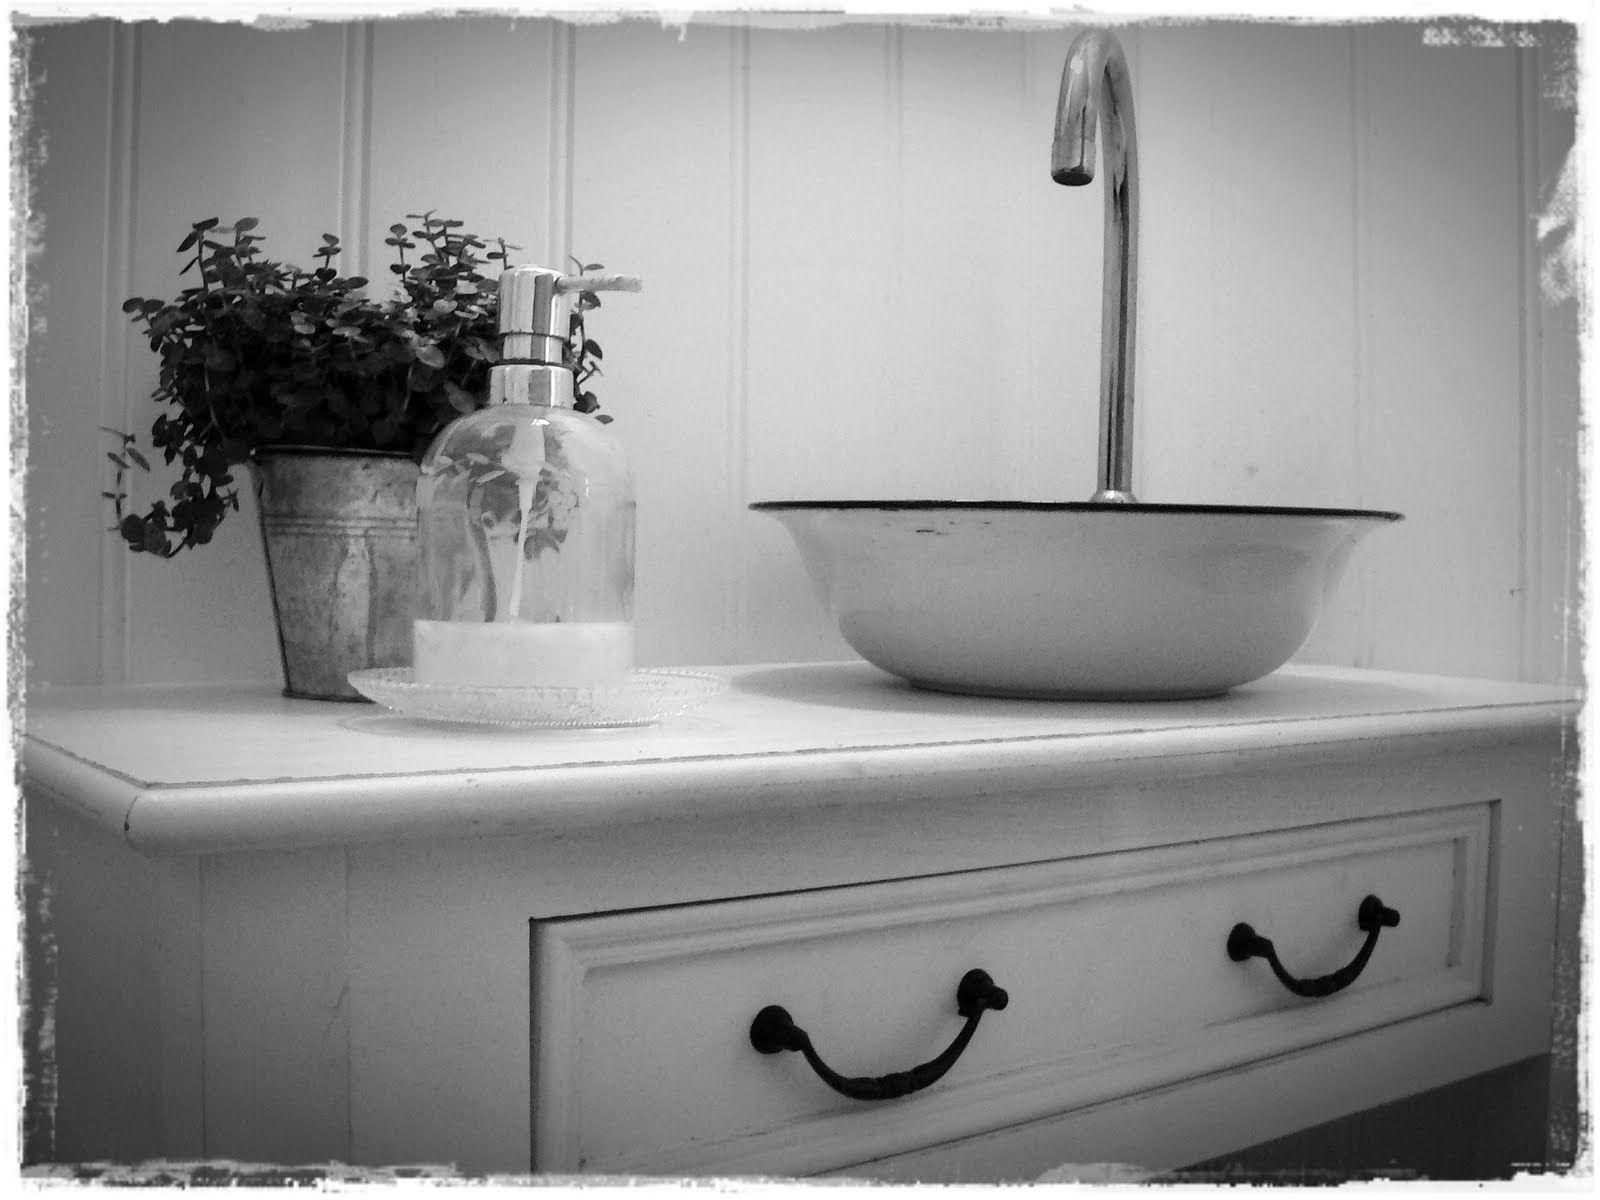 Sink Idea For Diy Bathroom White Grey Chippy Shabby Chic Whitewashed Cottage French